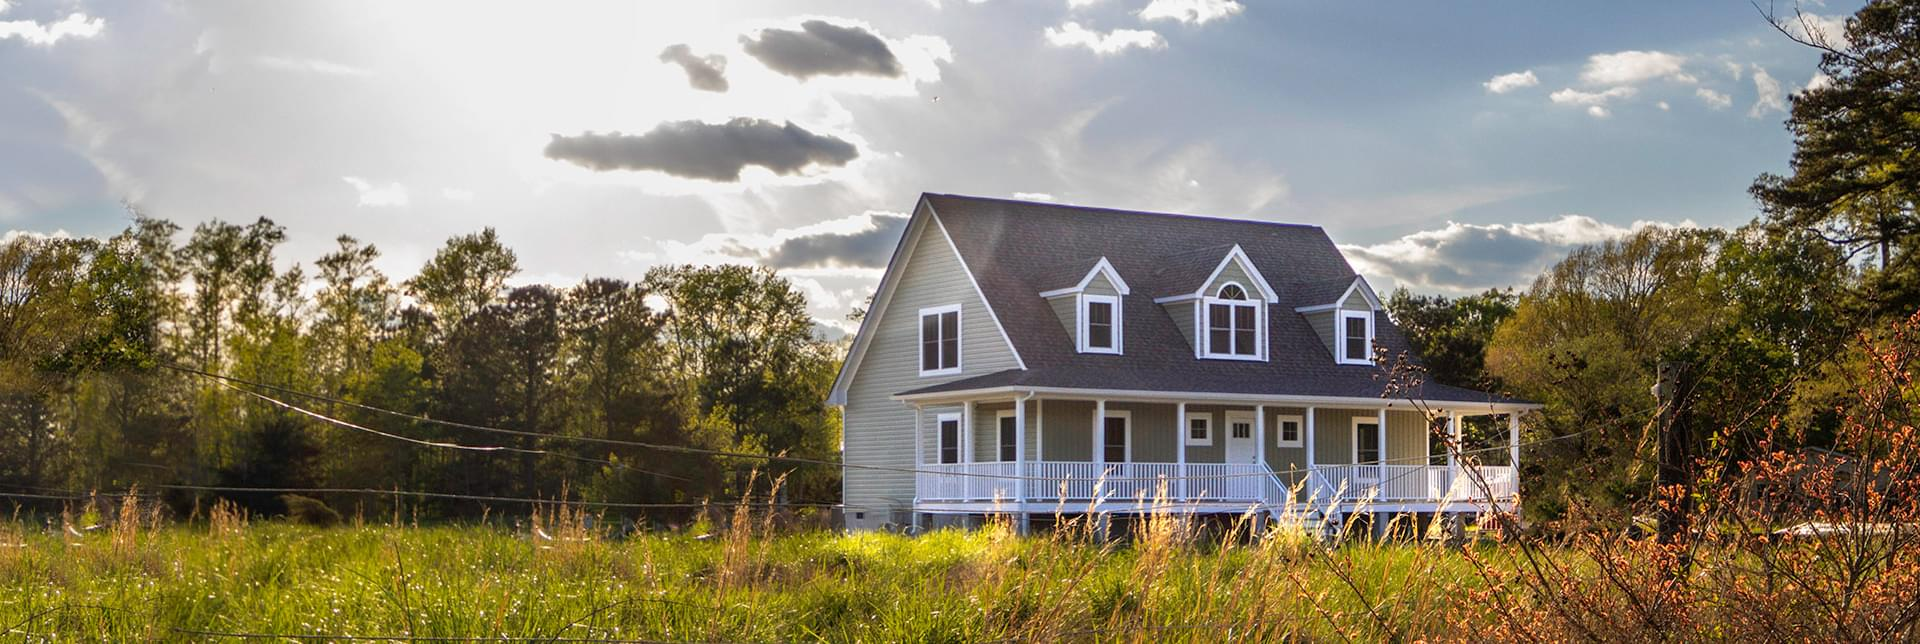 New Homes in Cumberland County VA